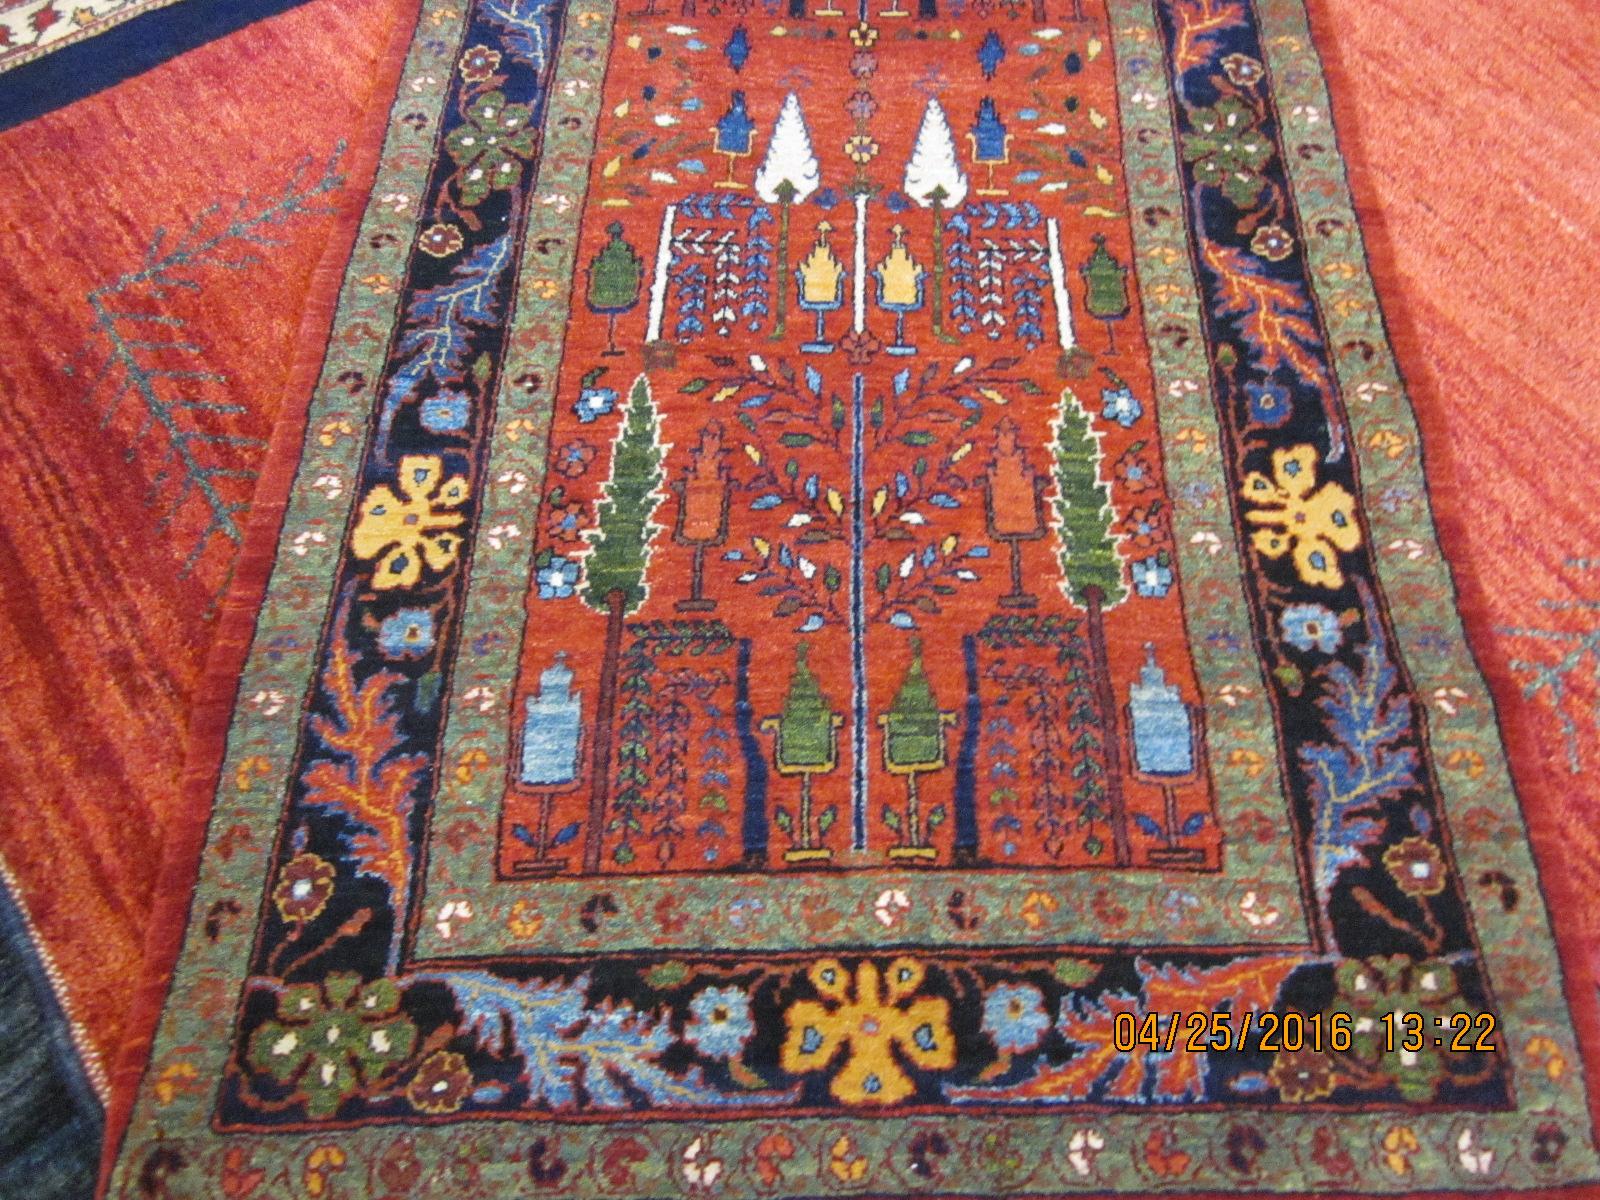 6 ft. Bijar runner, Bid Majnun design. (Cypress and Willow)